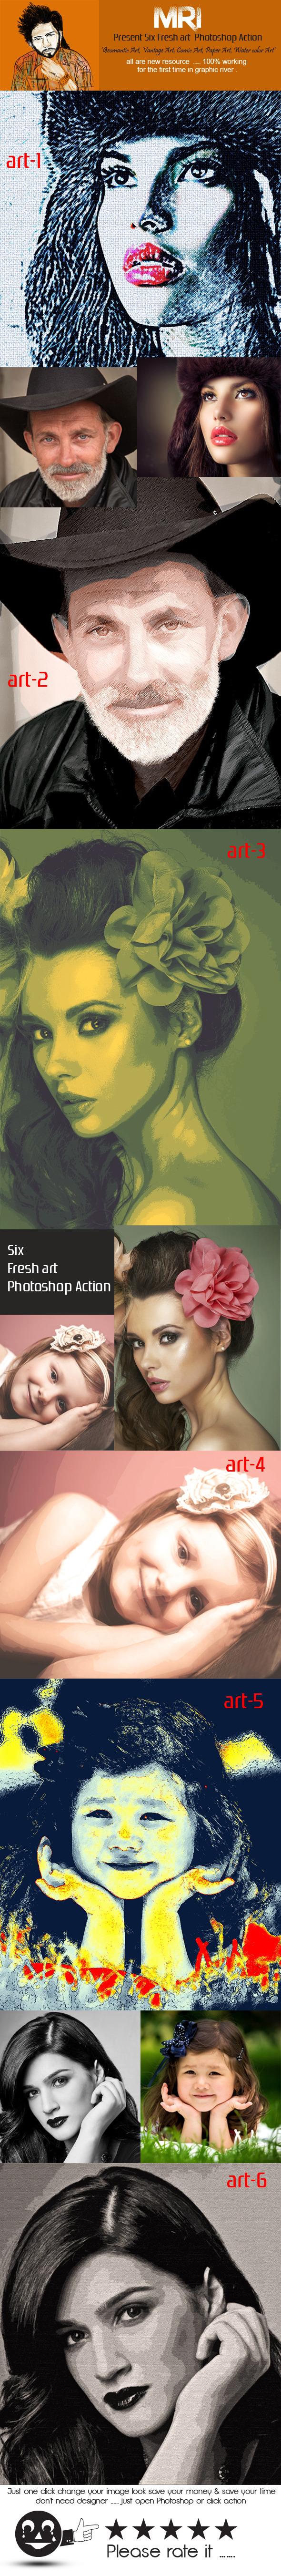 Fresh Art - Actions Photoshop